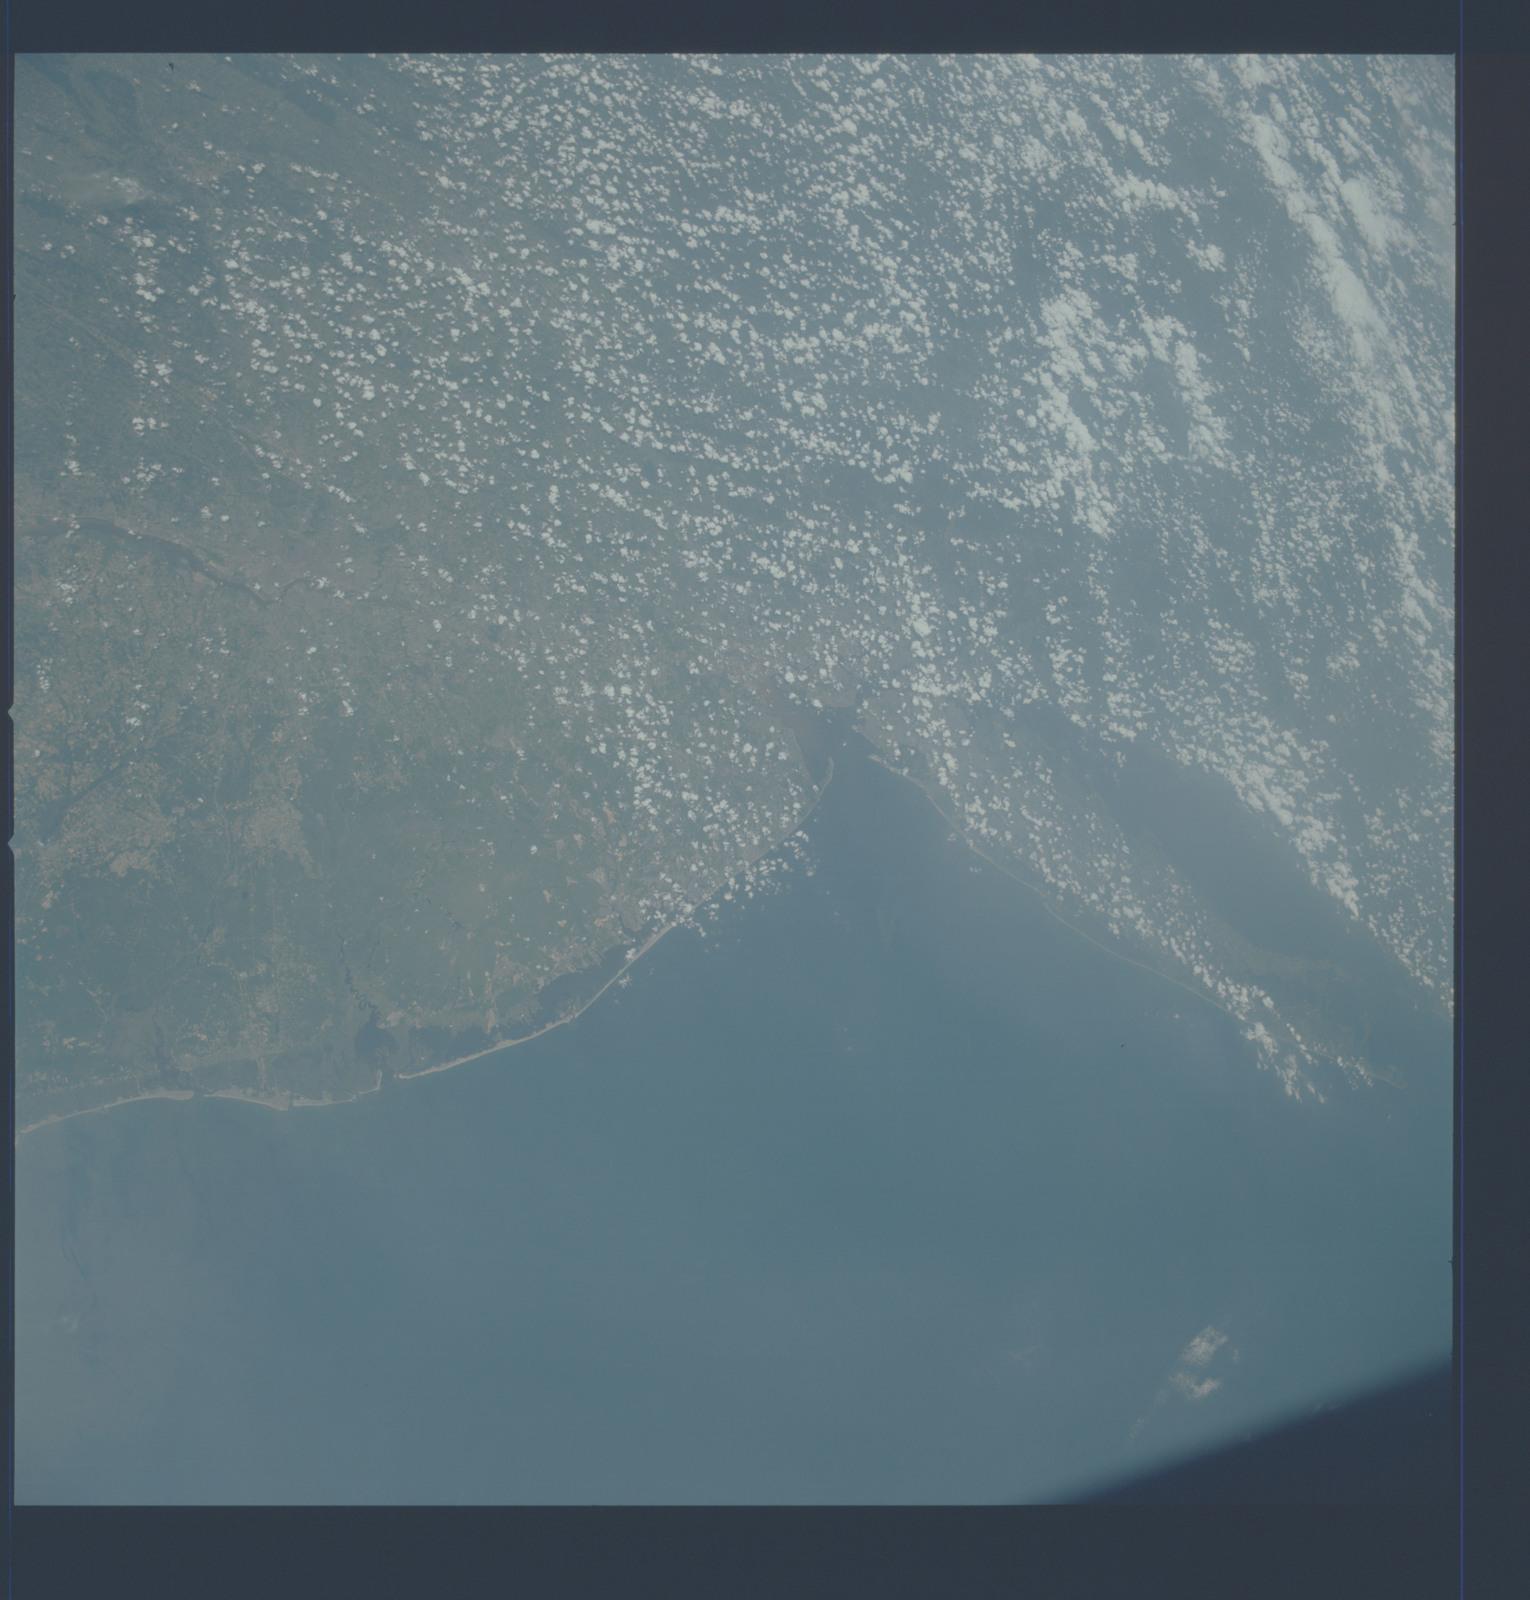 AST-21-1694 - Apollo Soyuz Test Project - Apollo Soyuz Test Project, New York, New Jersey, Pennsylvania, Connecticut, New York, Philadelphia, Long Island